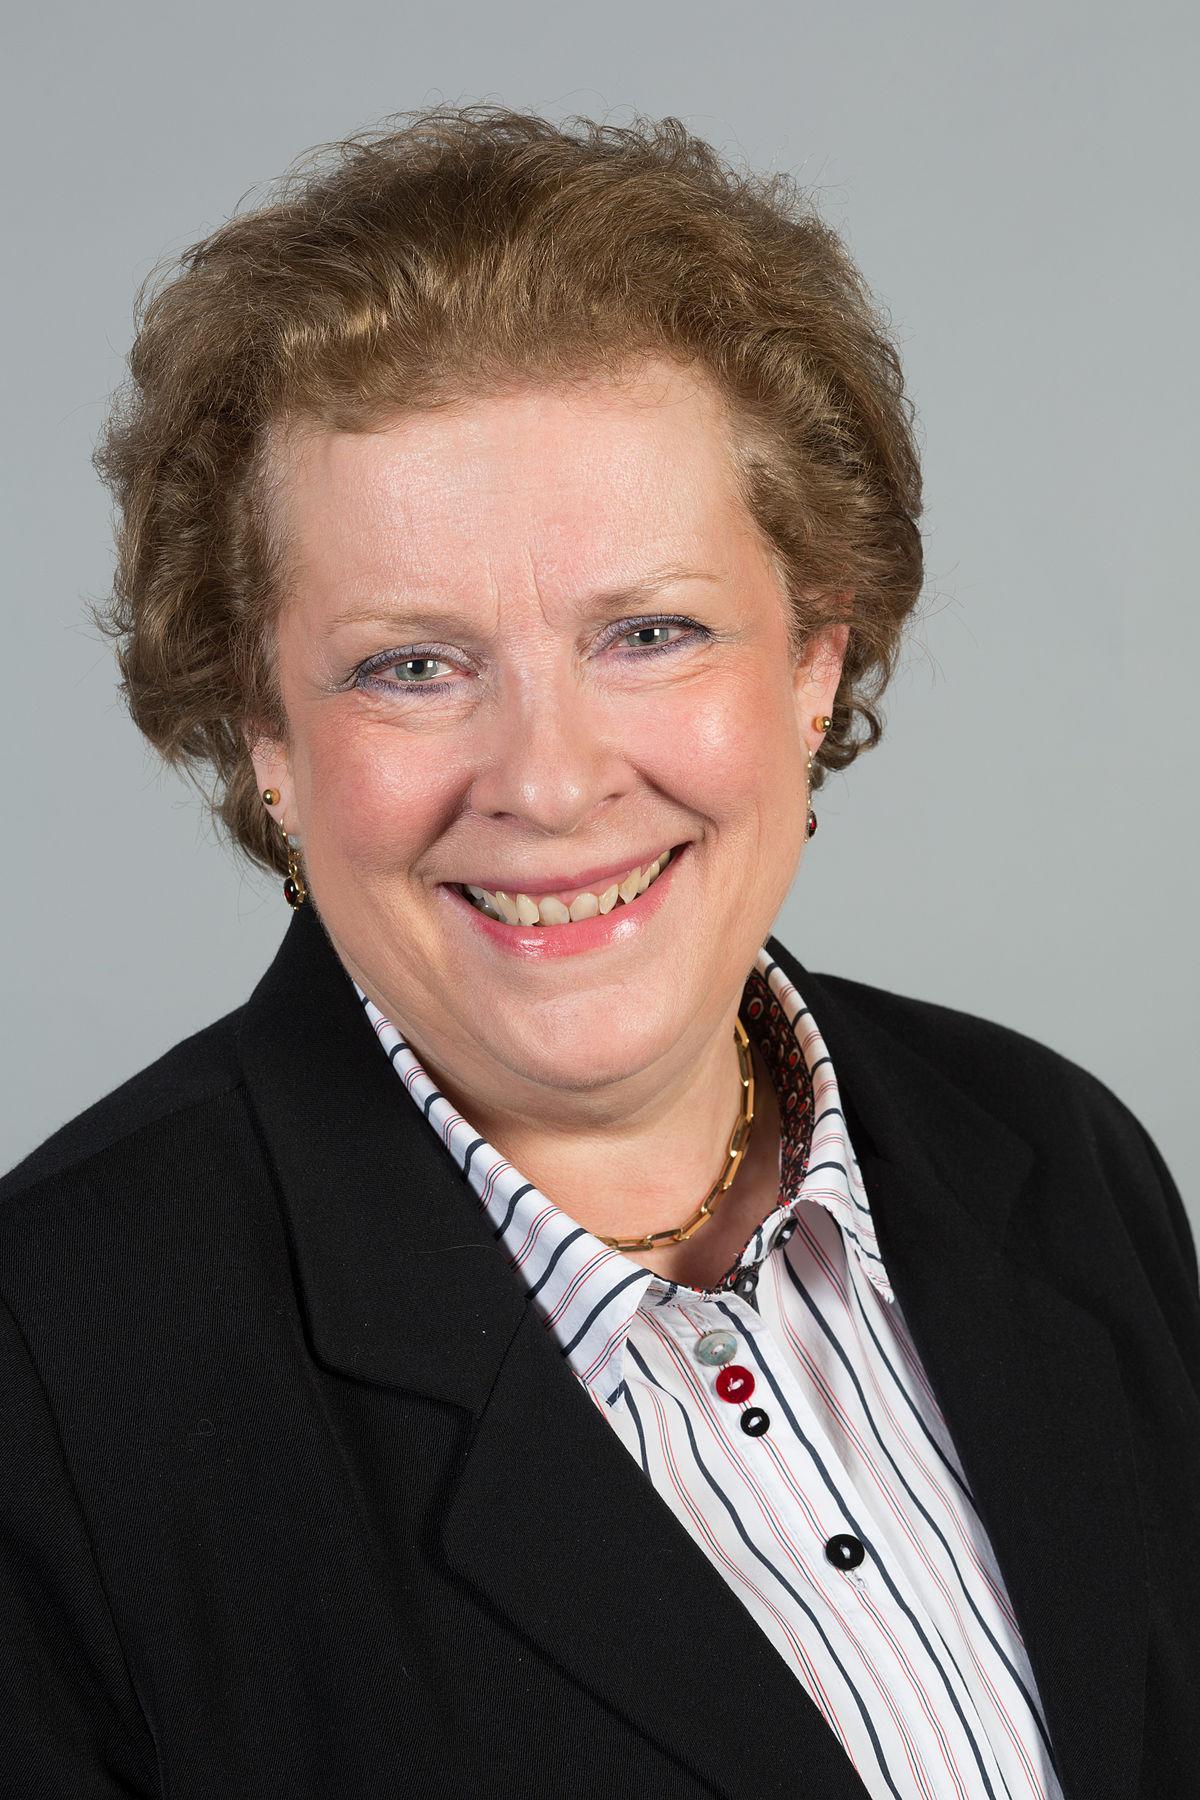 New York Prime >> Catherine Trautmann - Wikipedia